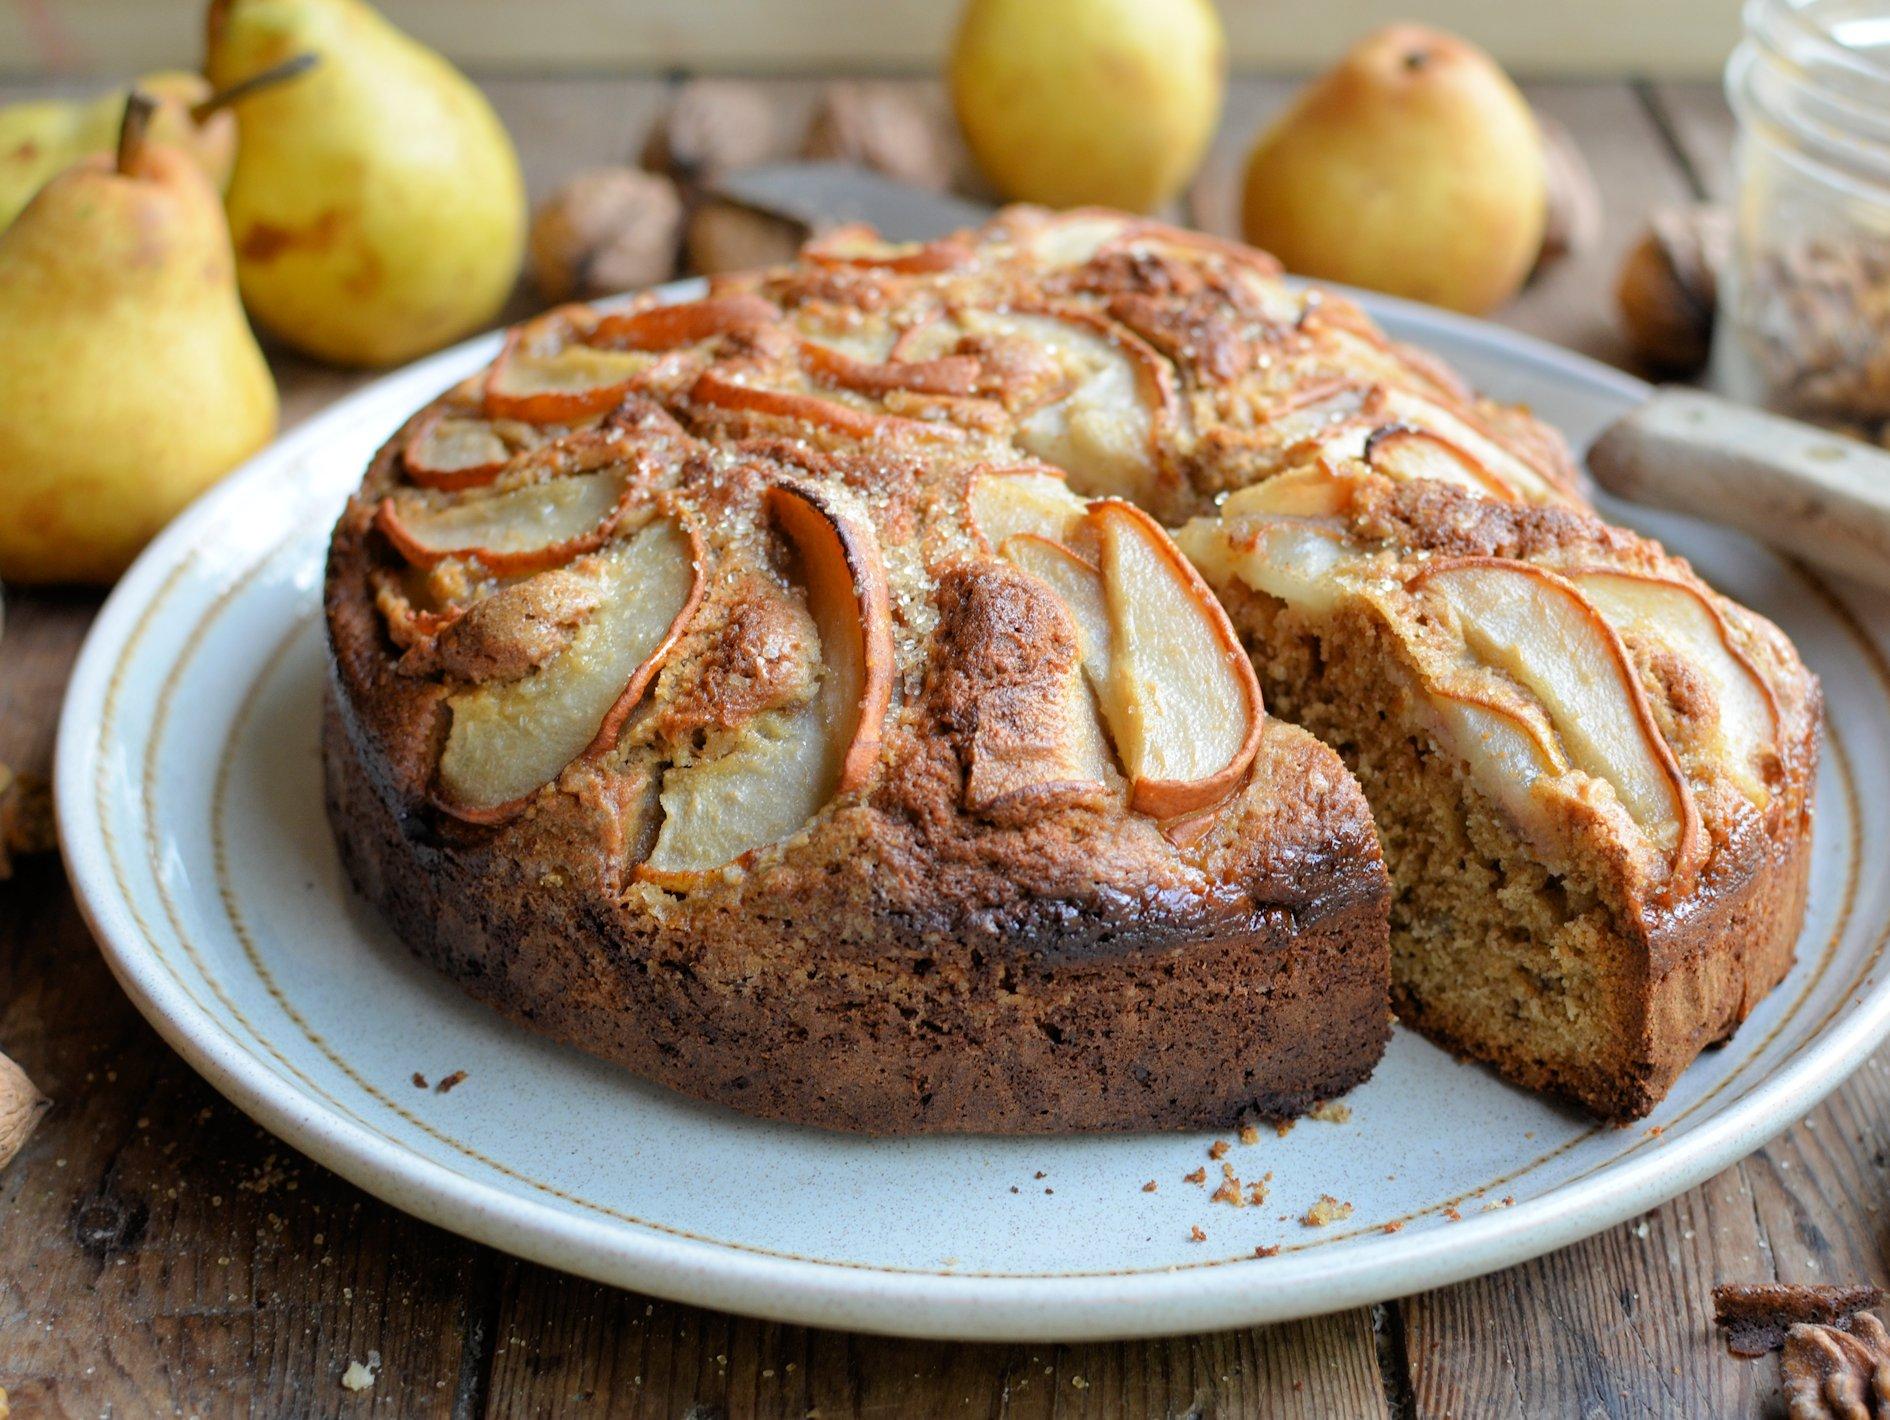 Thrifty & Organic November: Pear & Walnut Cake, Sausage Cabbage Rolls and Celeriac Gratin